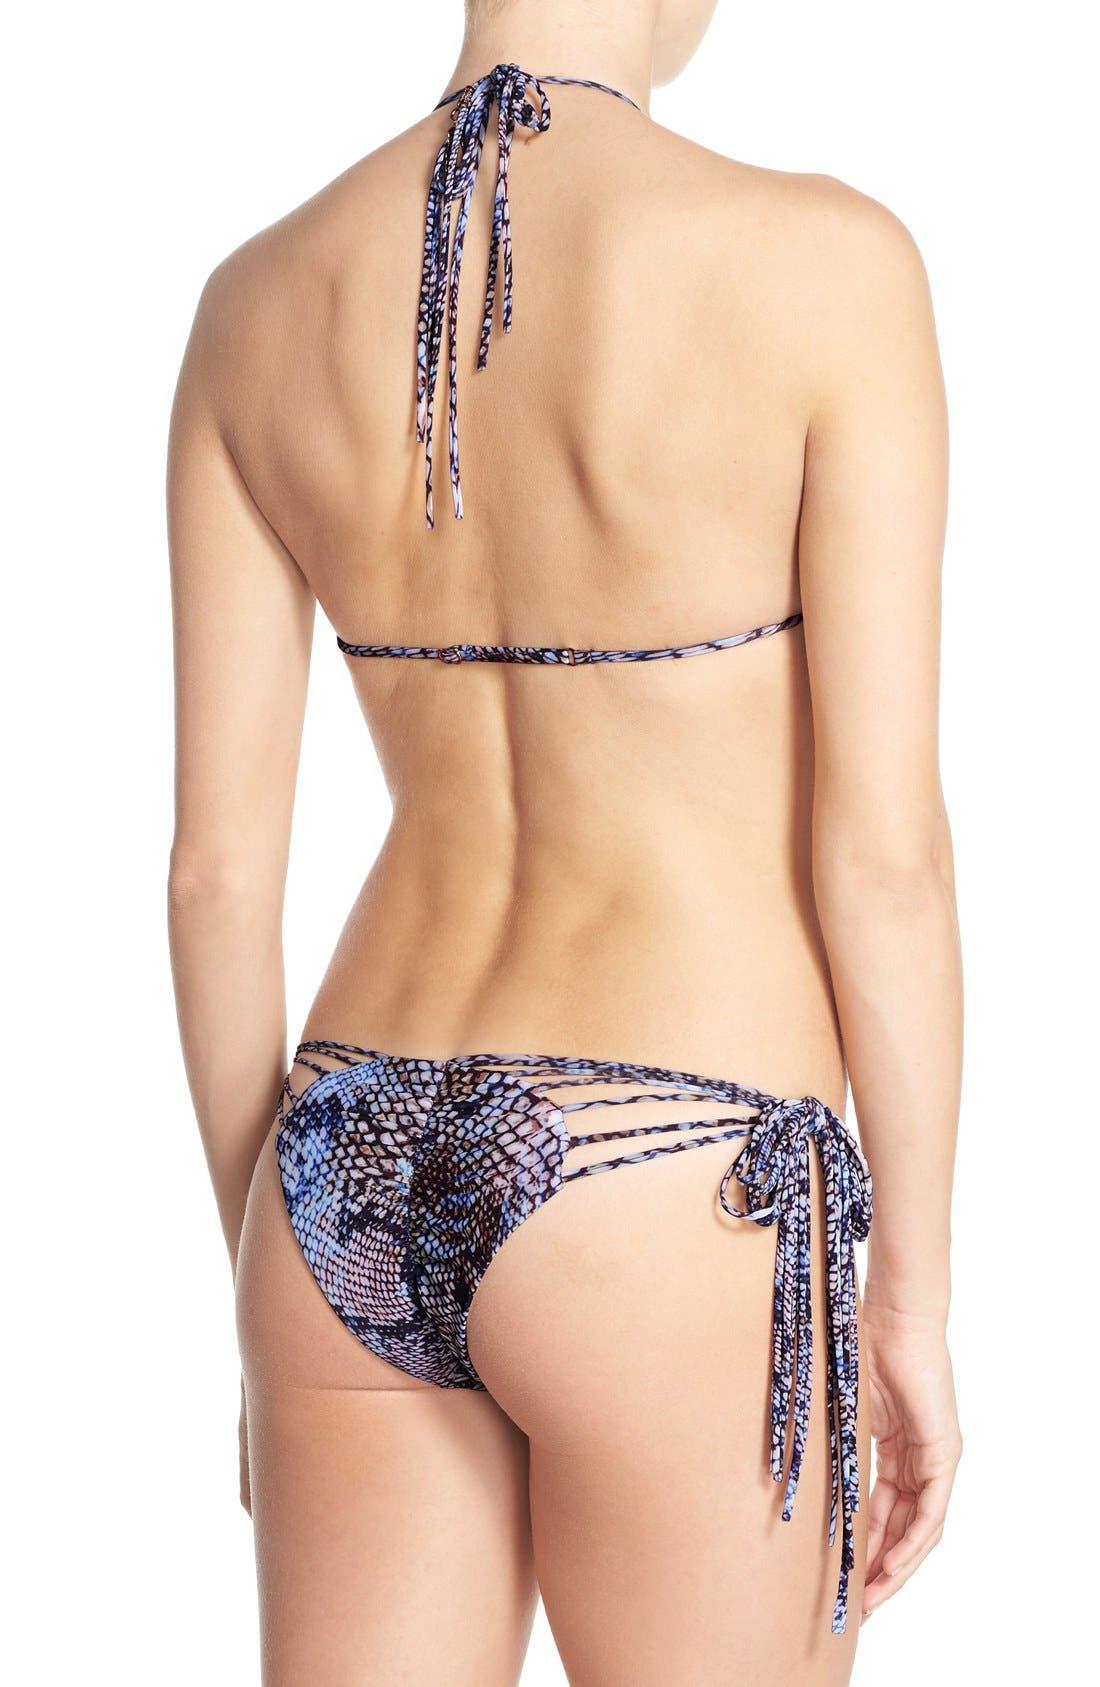 ALE BY ALESSANDRA,                             'Boa Forma' Triangle Bikini Top,                             Alternate thumbnail 3, color,                             400